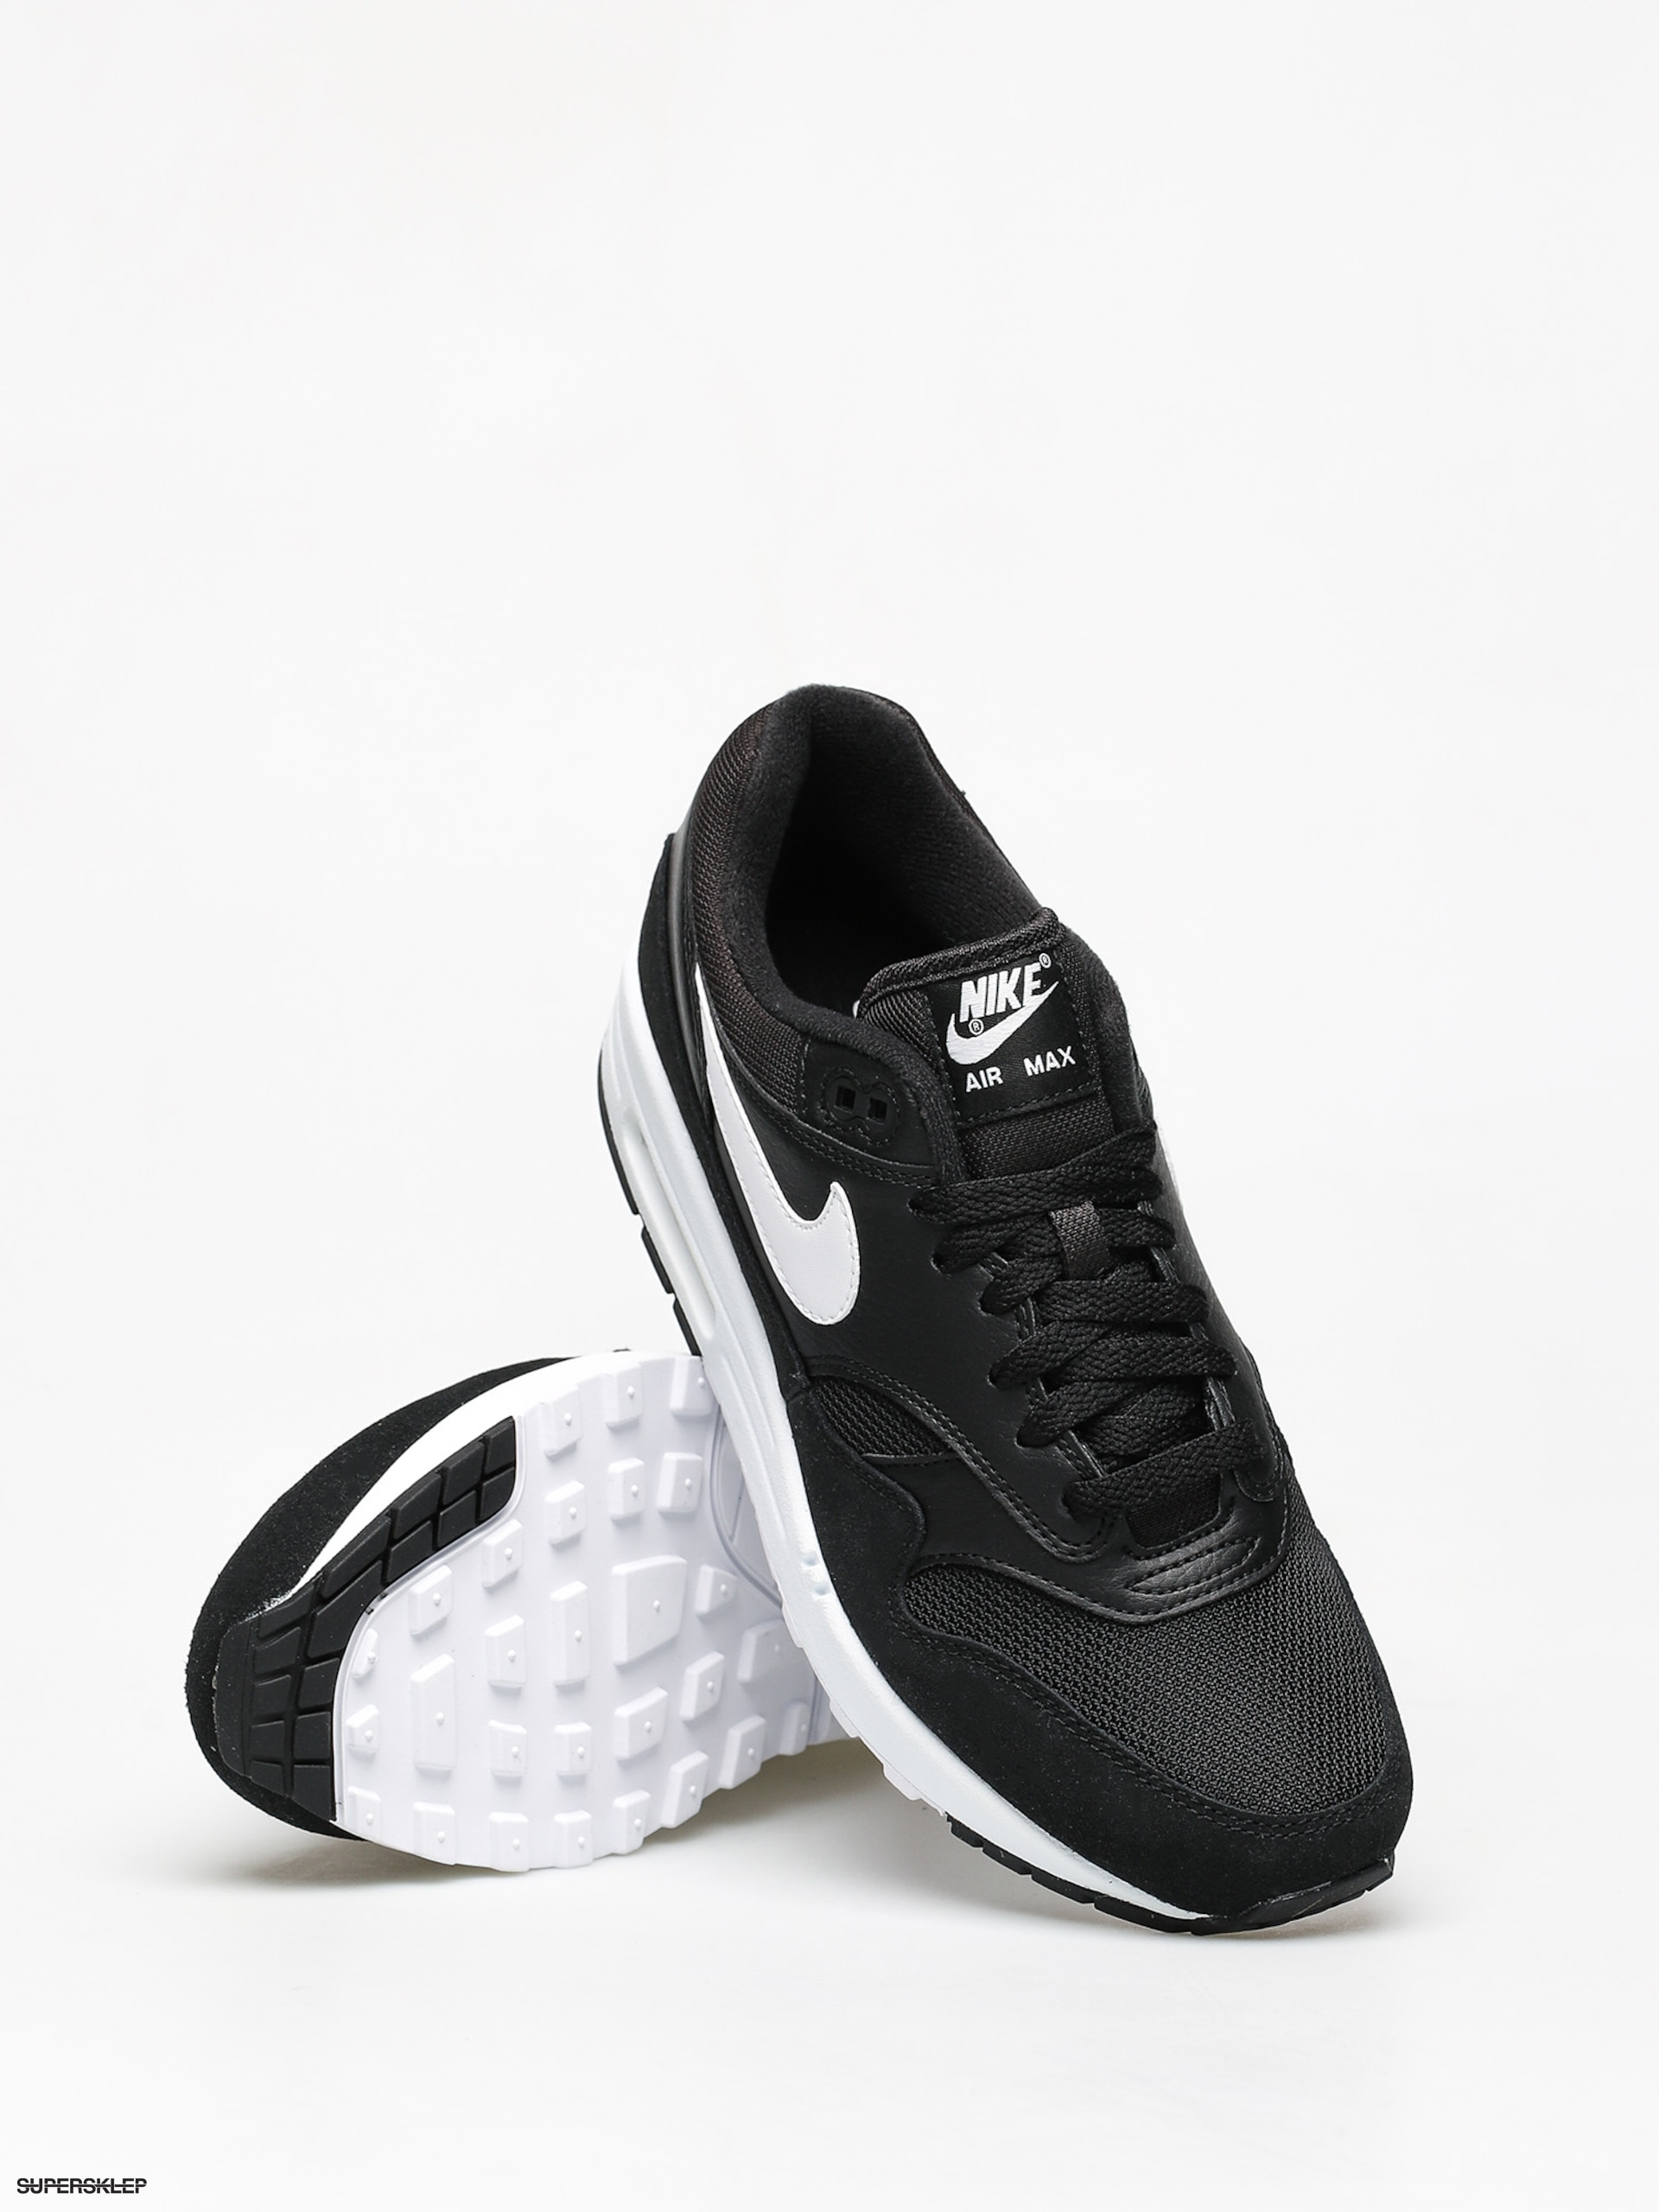 Buty Nike Air Max 399 modeli w cenie od 184,00 sklep